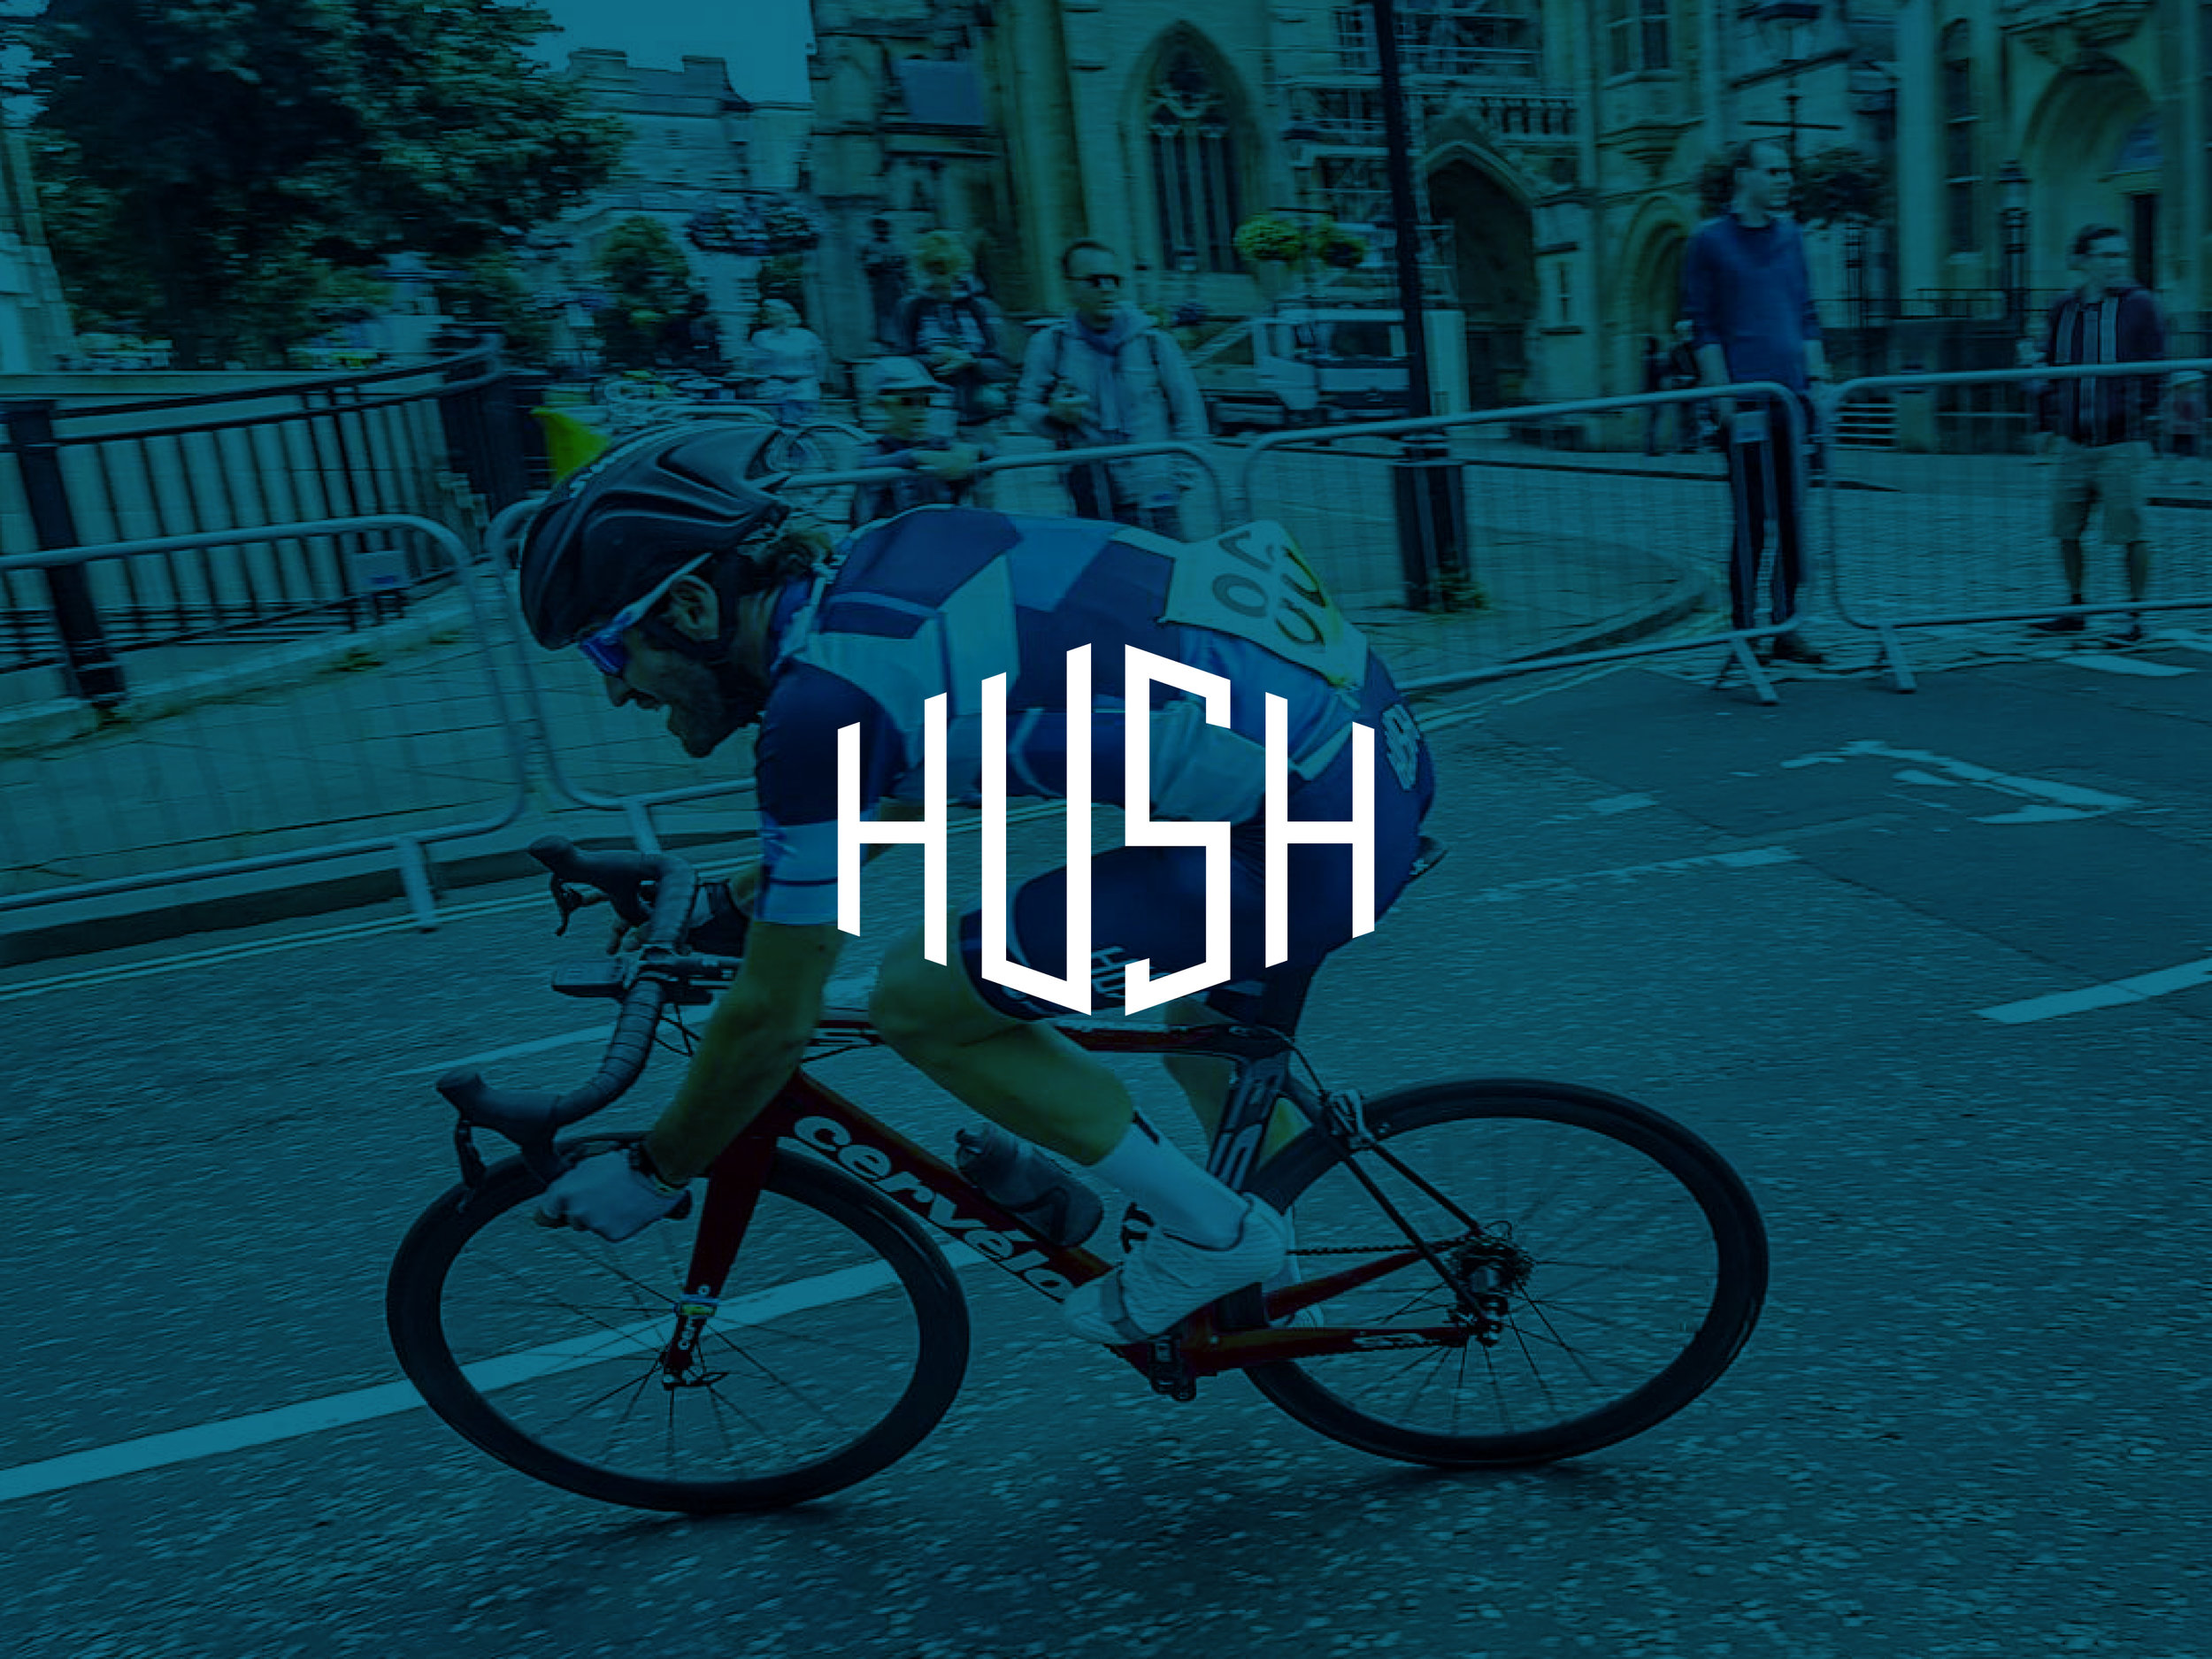 HushBrandImages2.jpg